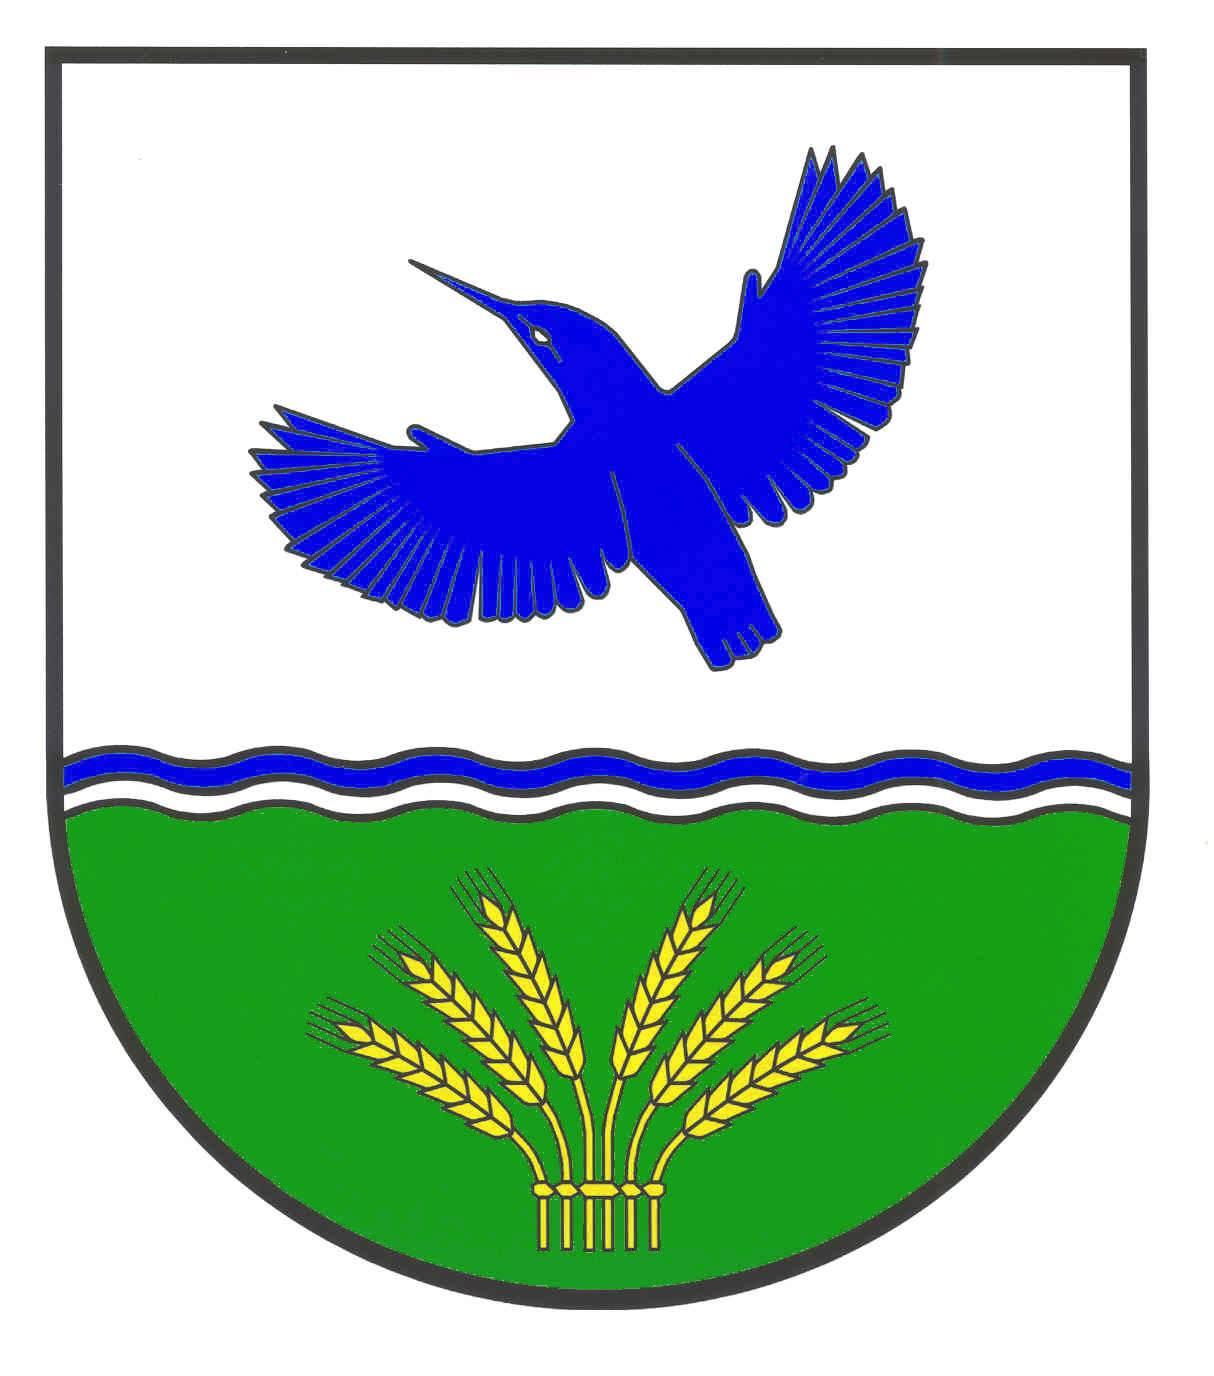 Wappen GemeindeRodenbek, Kreis Rendsburg-Eckernförde